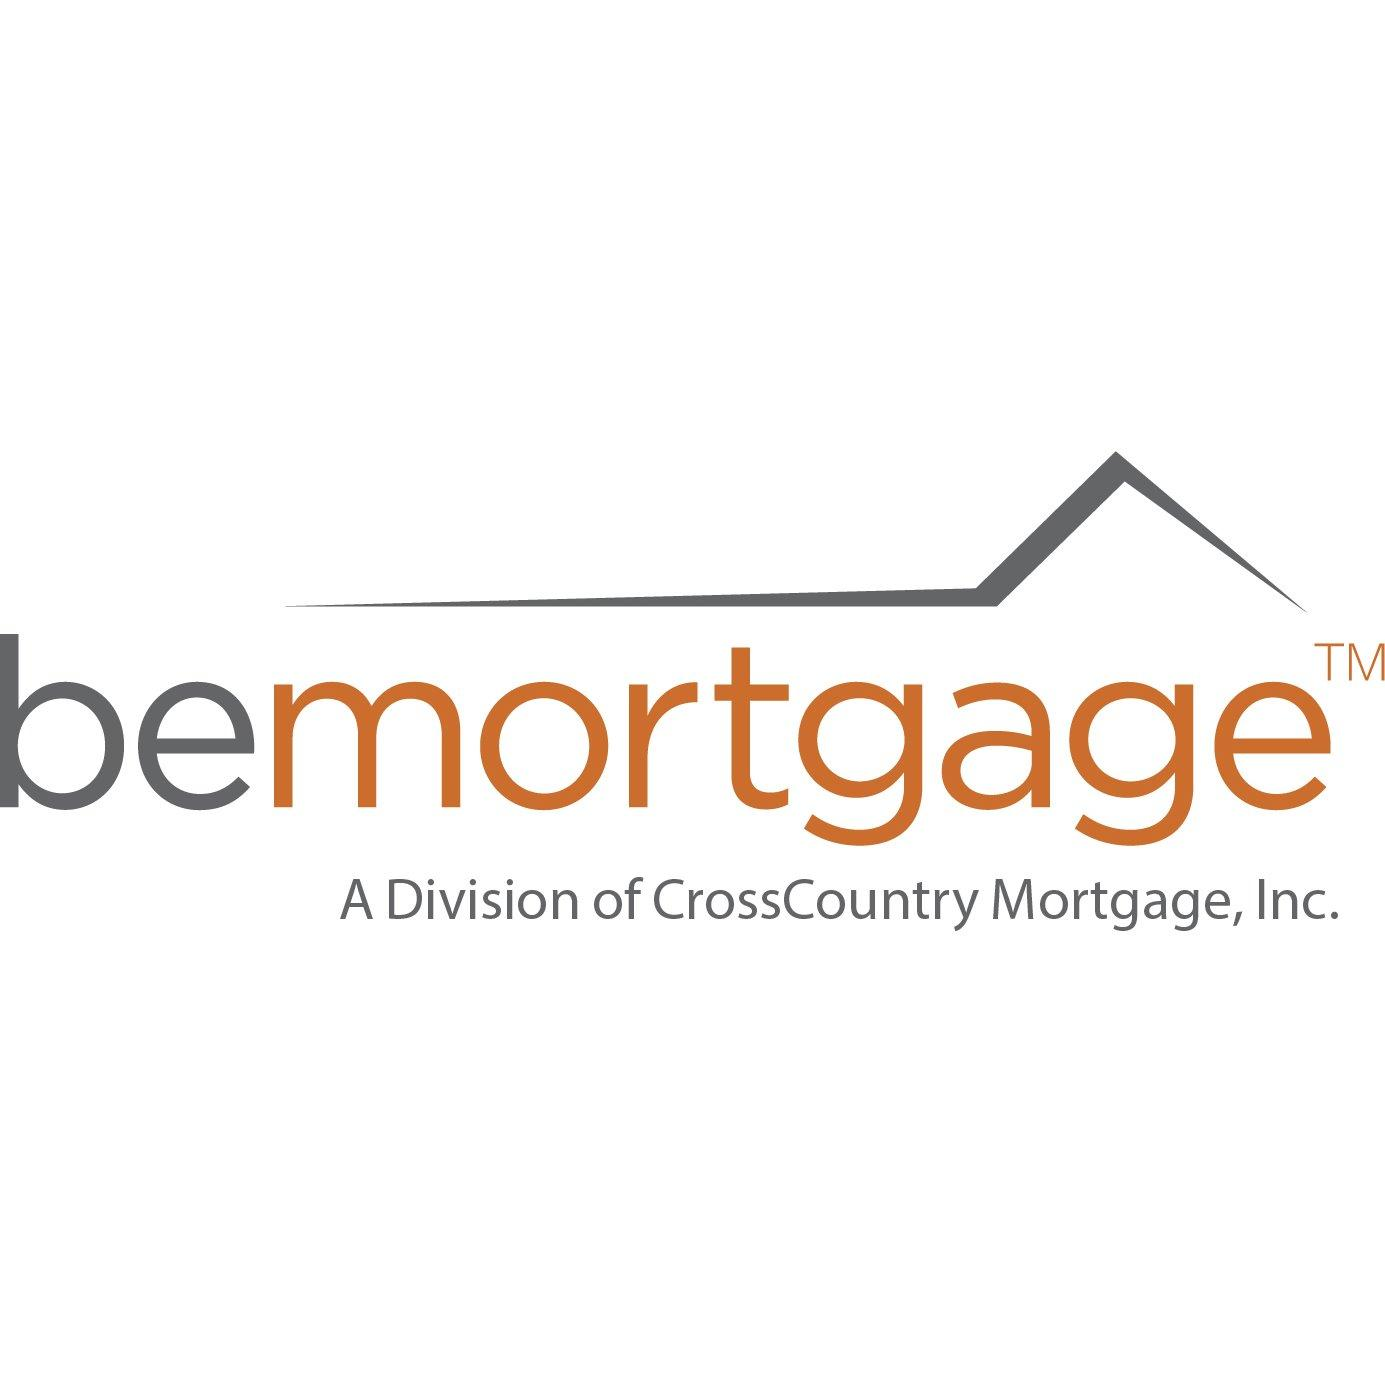 Blair Kerr at bemortgage, A Division of CrossCountry Mortgage, Inc.